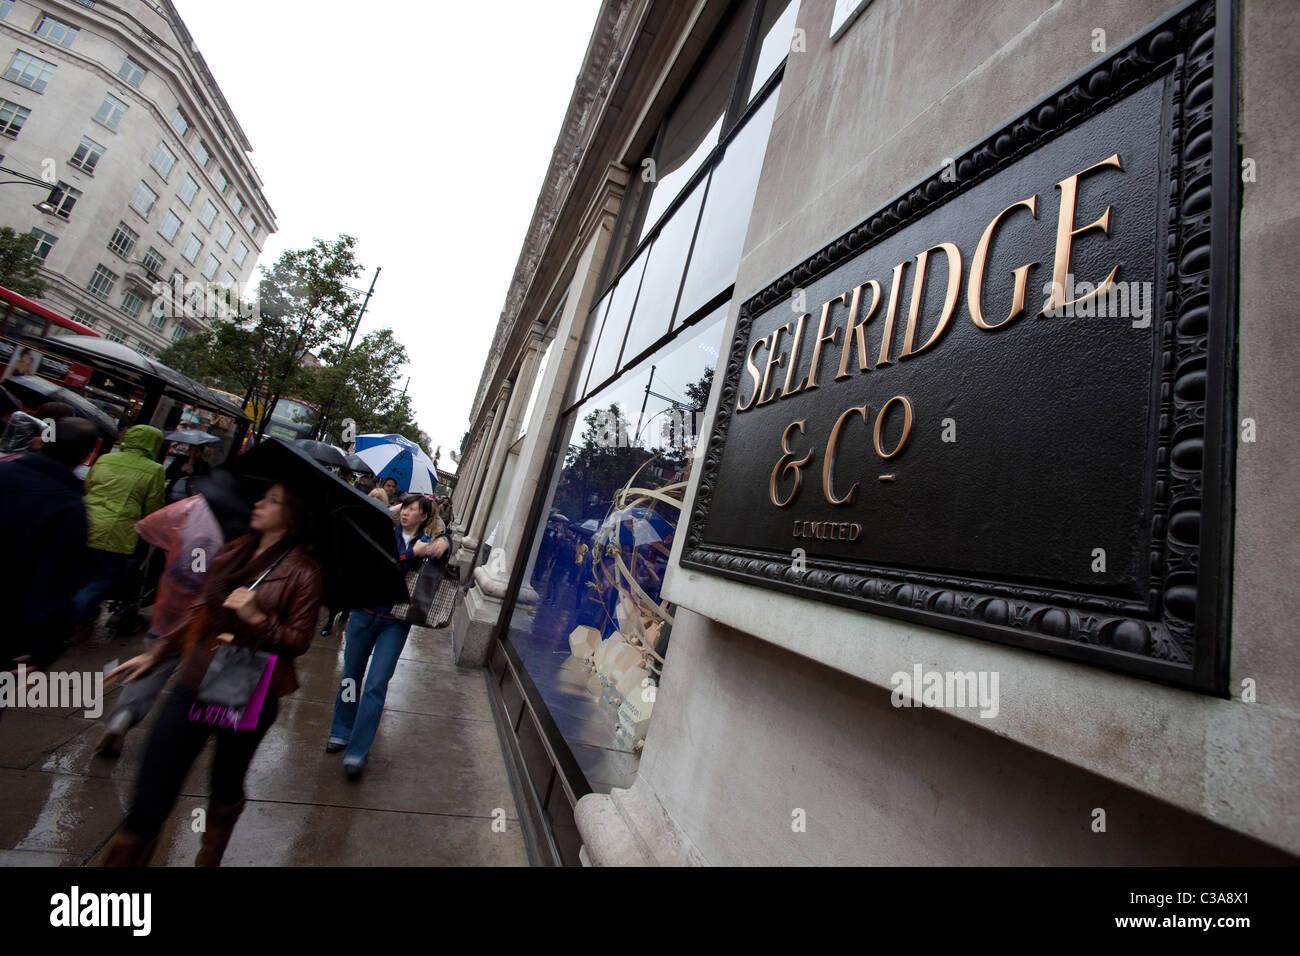 External shot of the flagship Selfridges store in London. - Stock Image